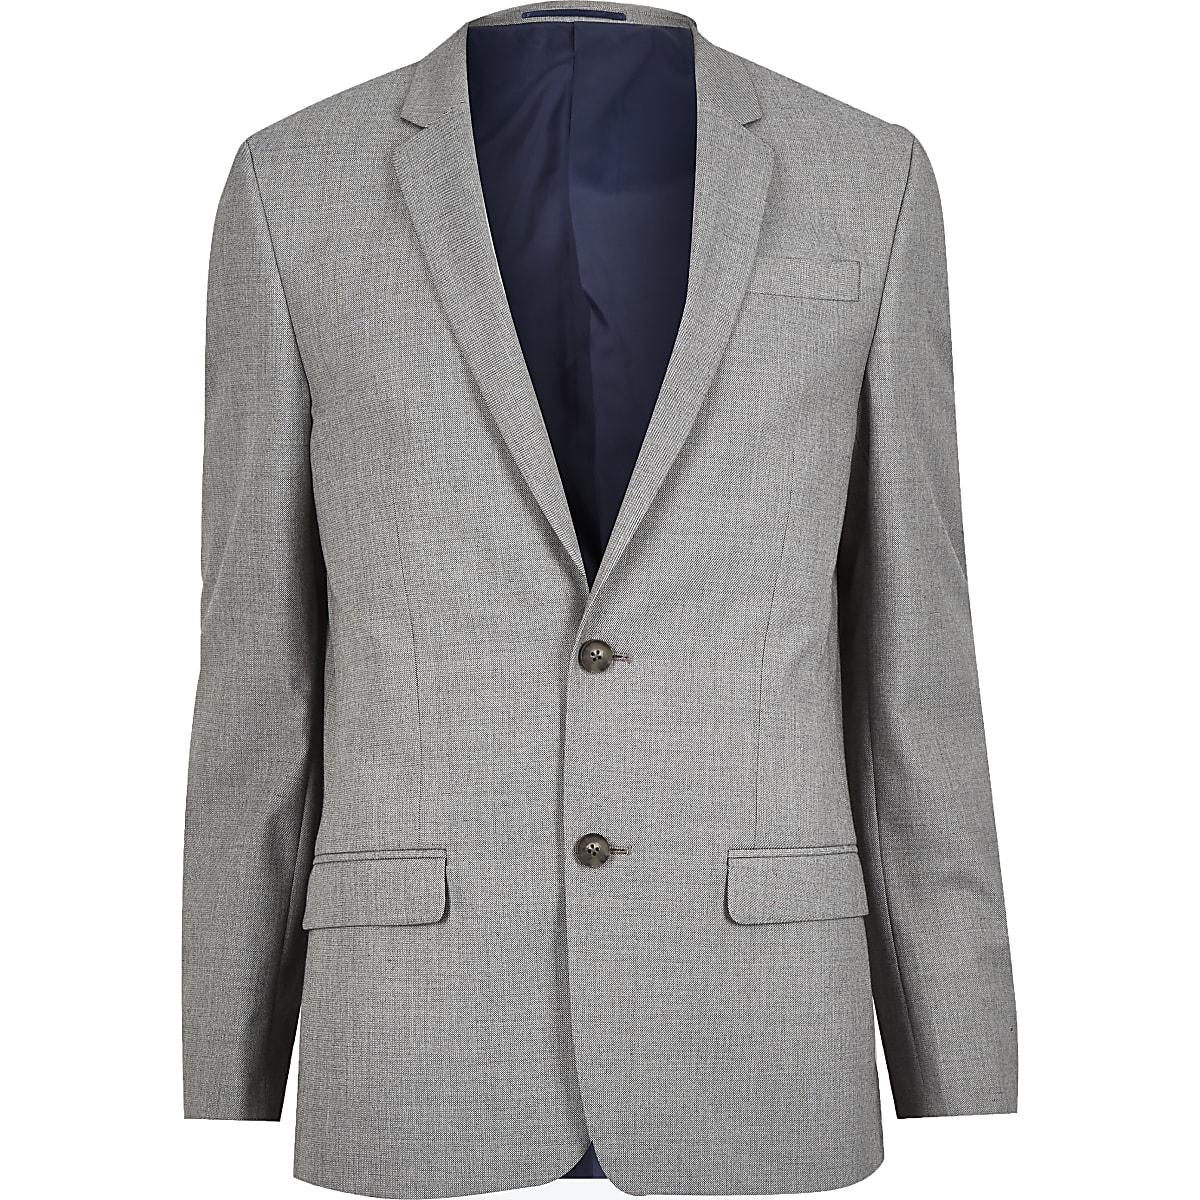 Grey slim fit suit jacket